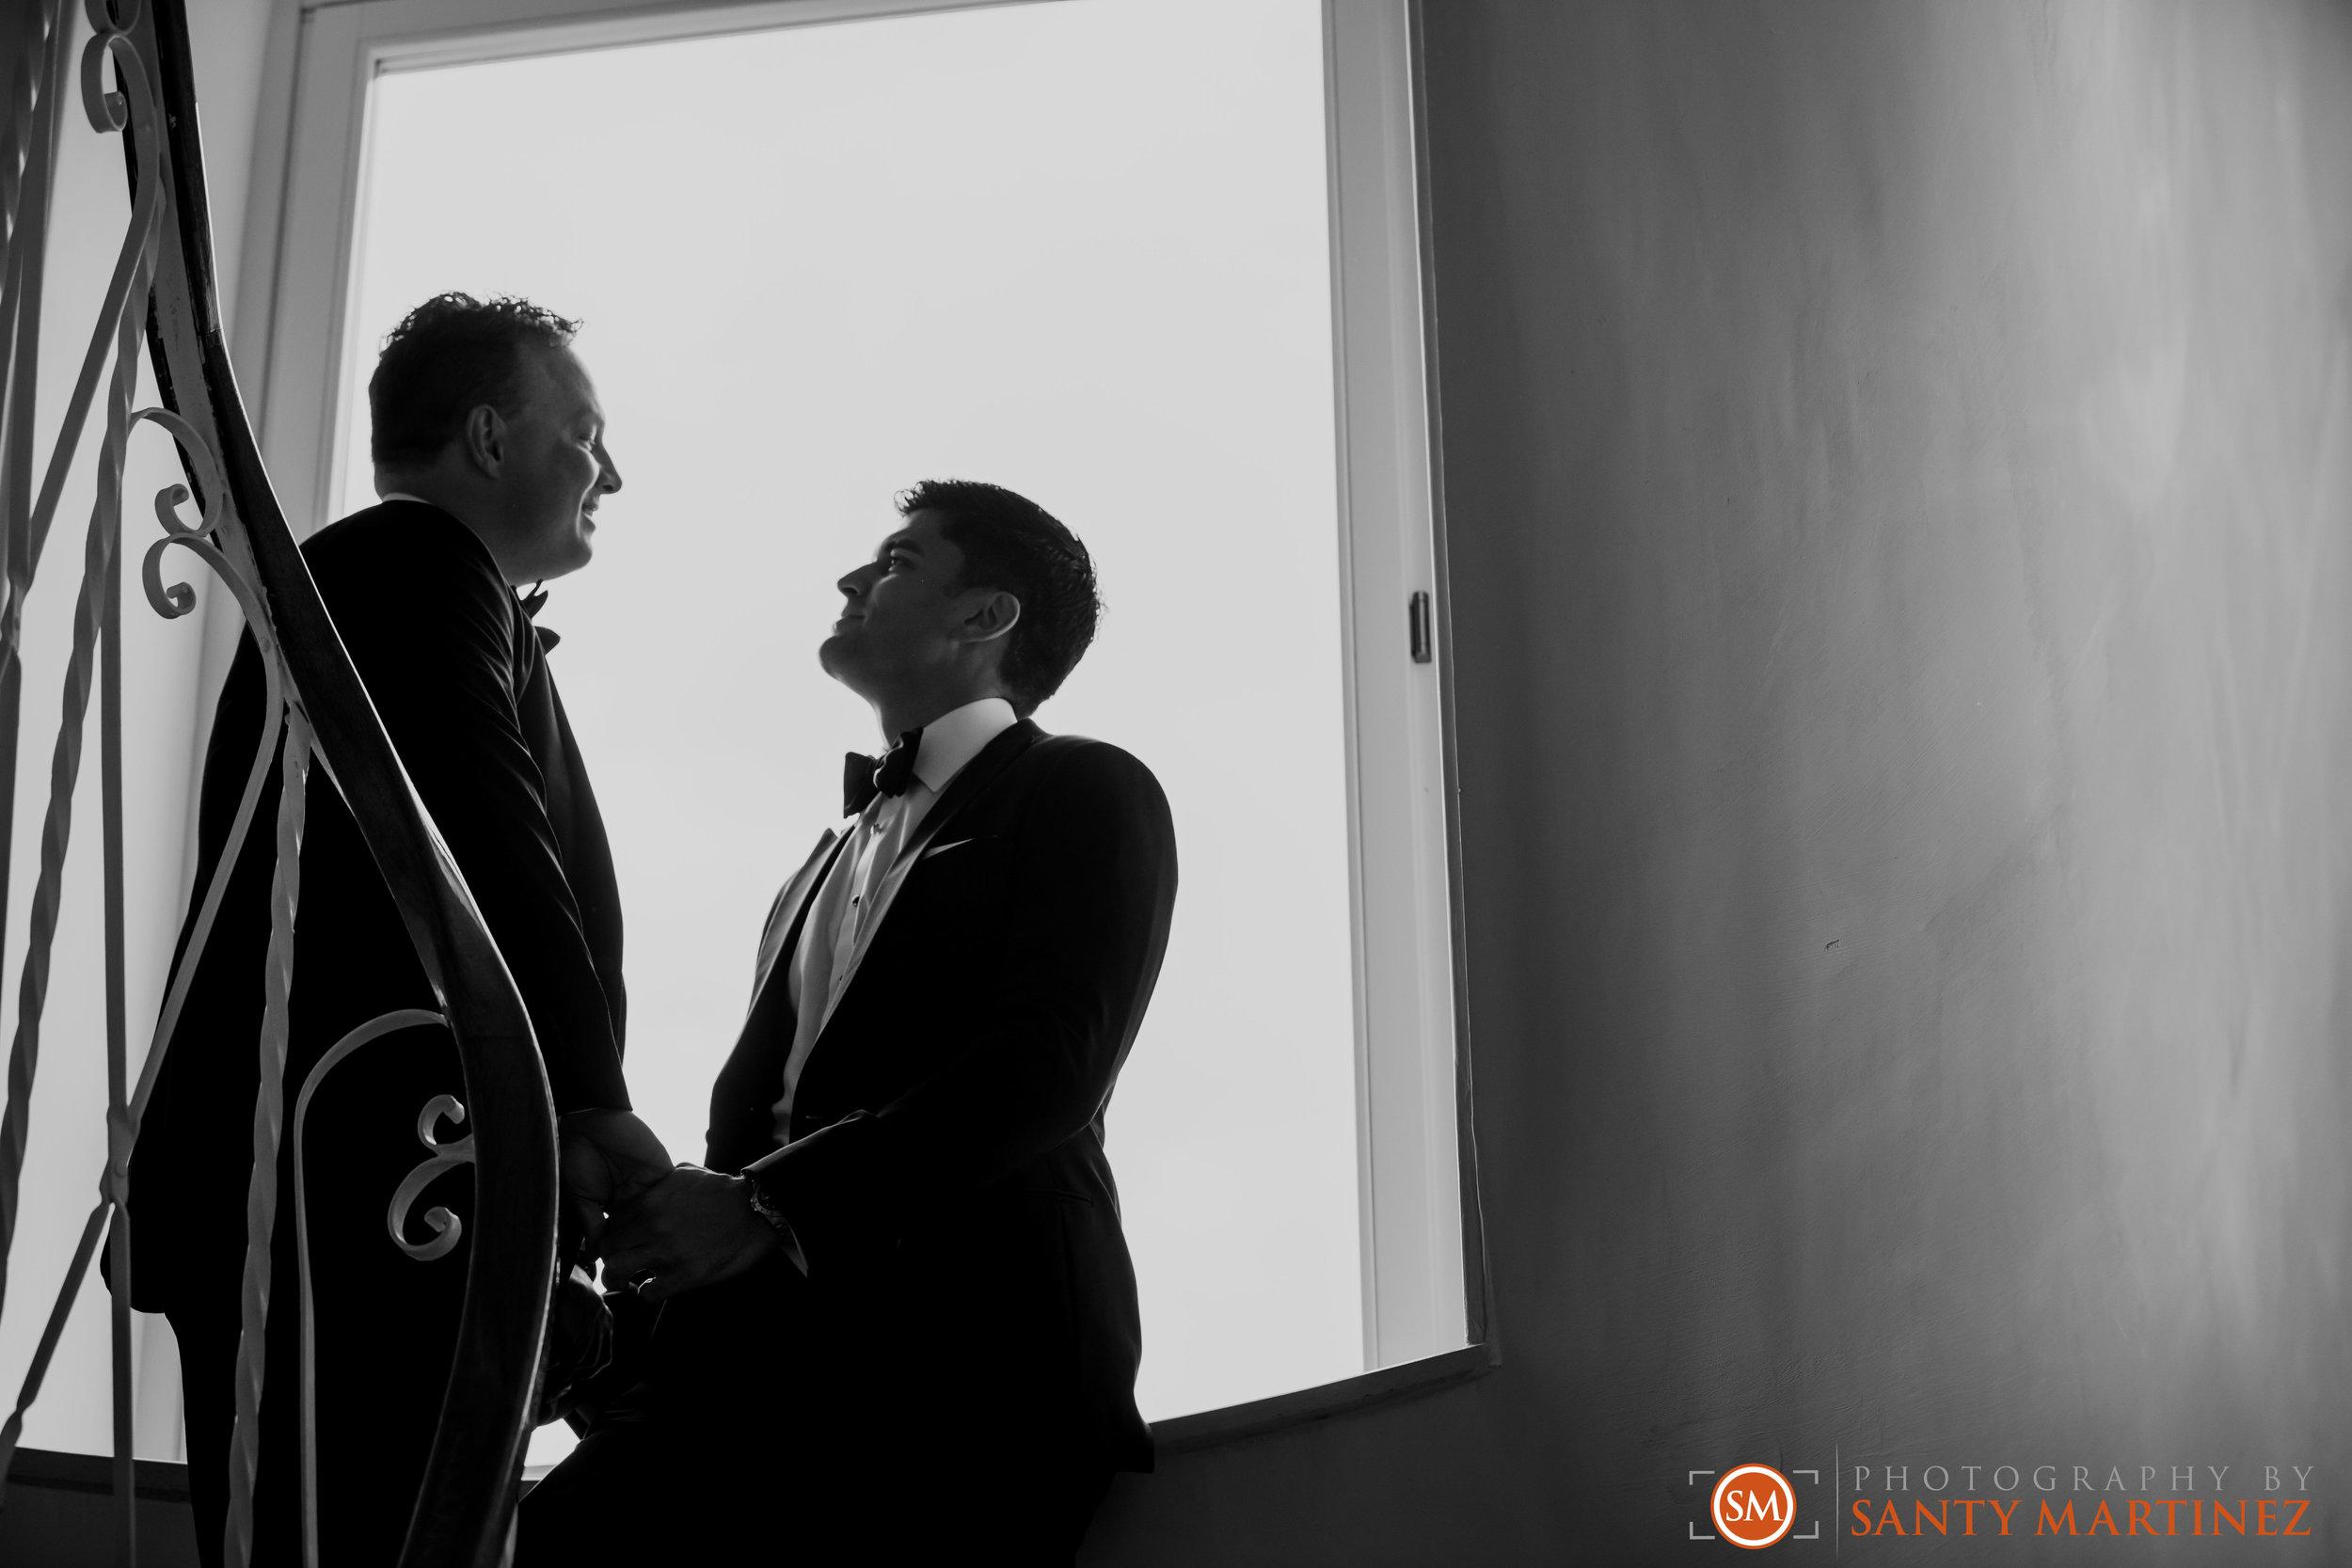 Wedding Capri Italy - Photography by Santy Martinez-11.jpg